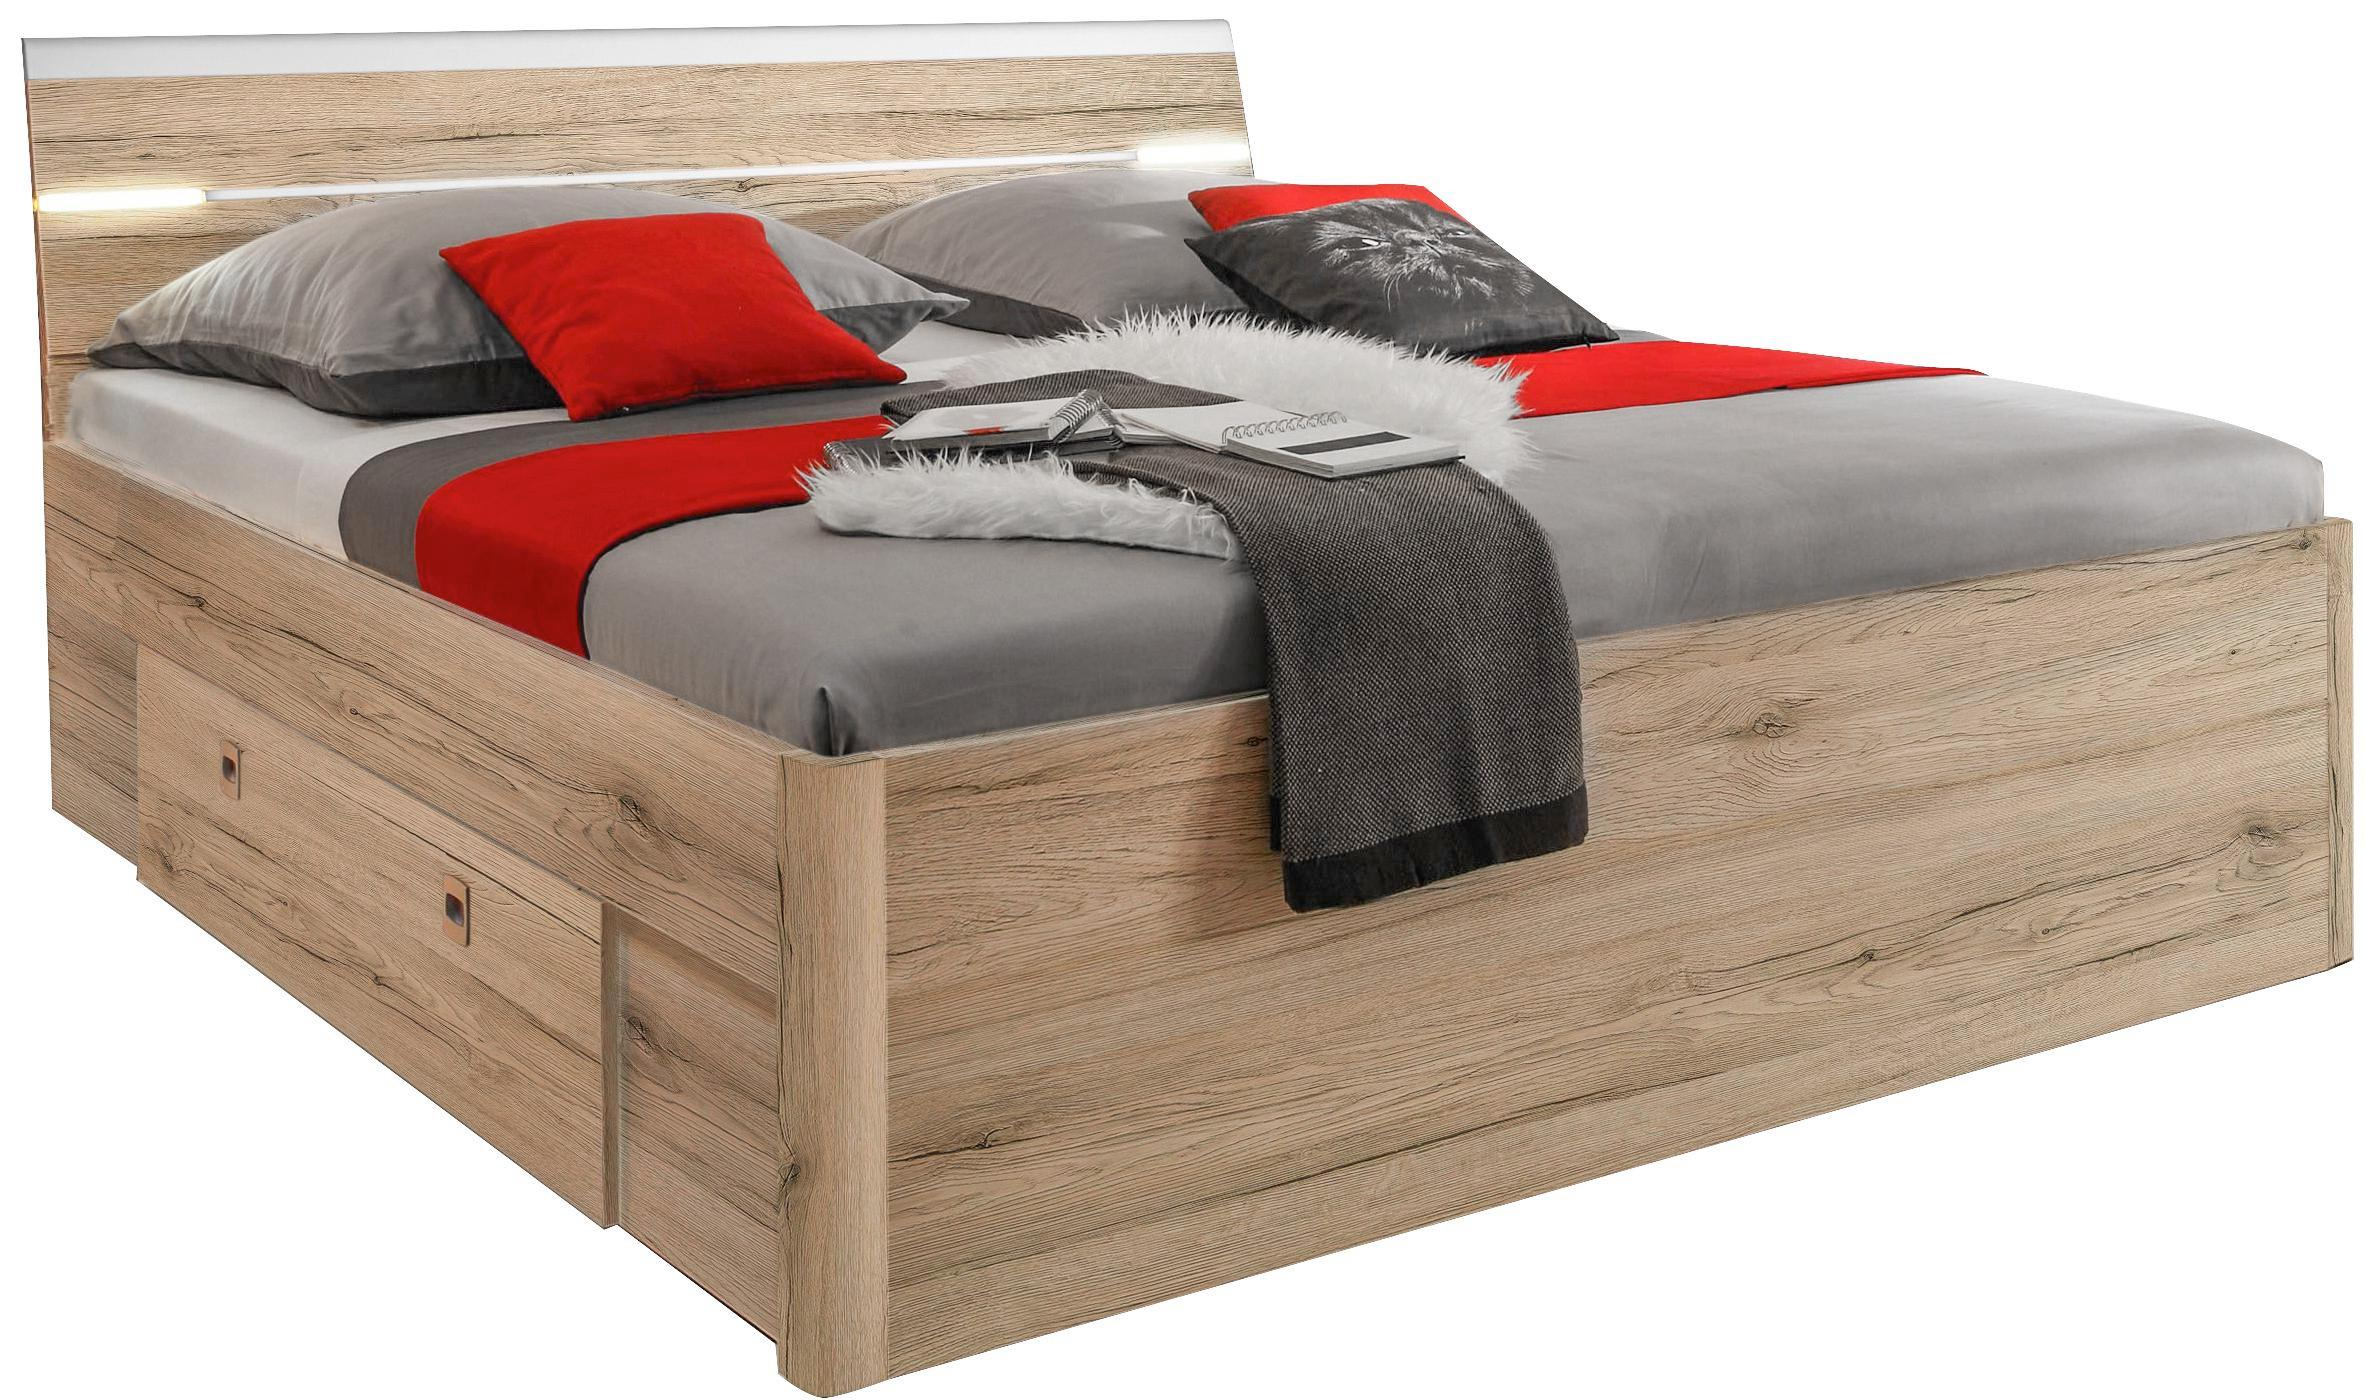 bettrahmen 140x200 amazing vidaxl polsterbett bettgestell bettrahmen lattenrost x cm schwarz. Black Bedroom Furniture Sets. Home Design Ideas